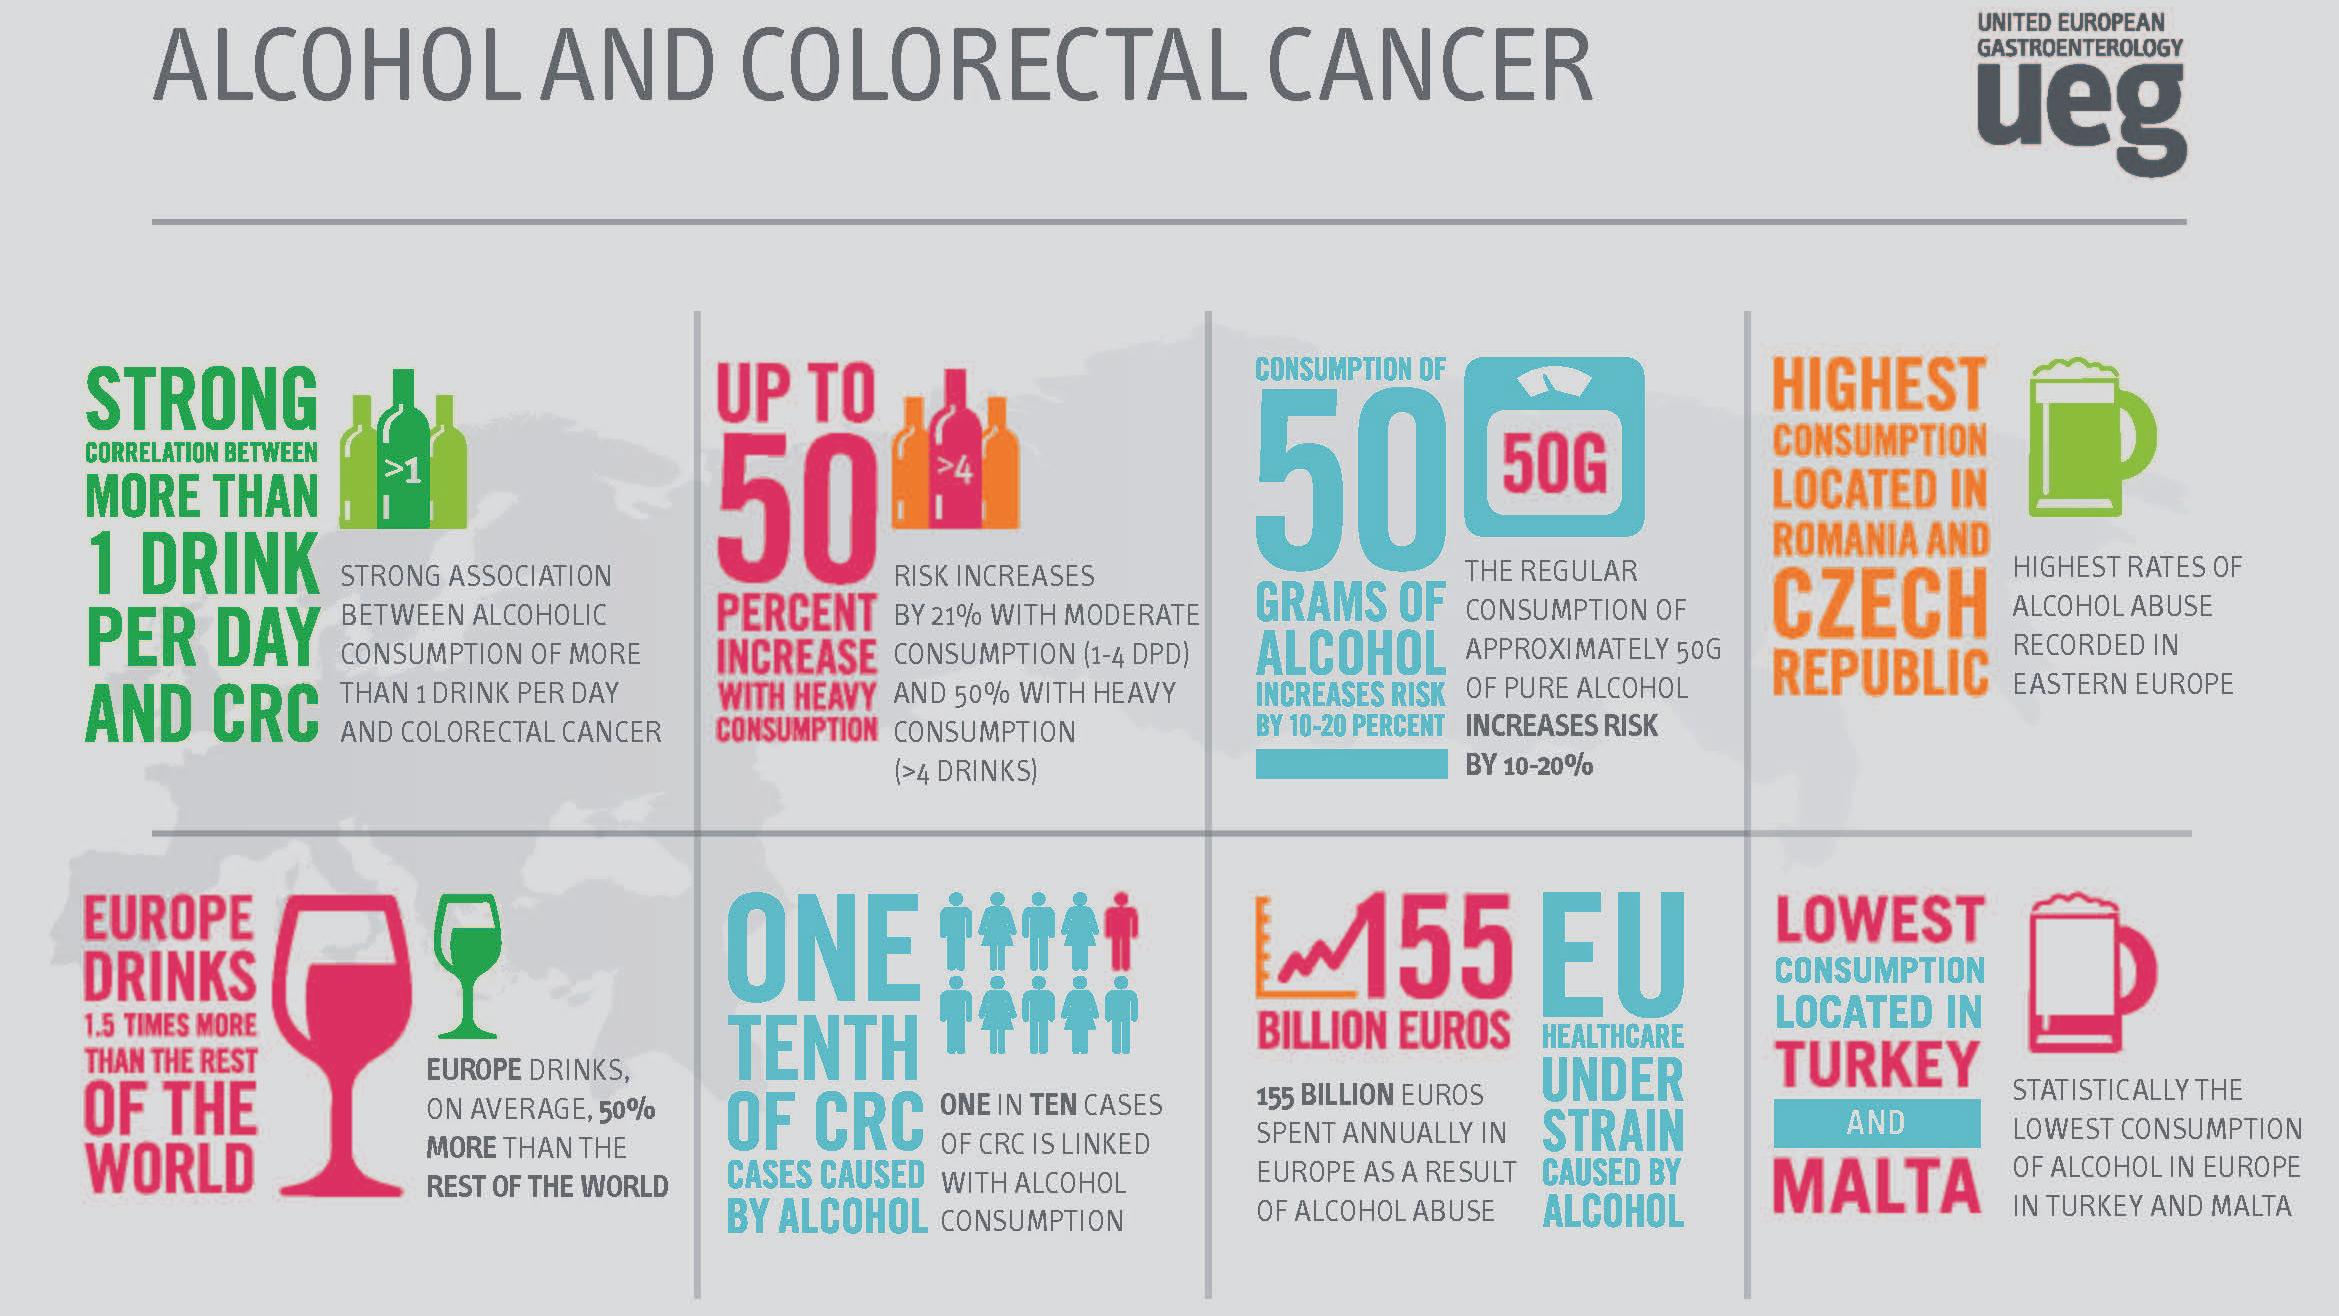 Drinking Trends Across Europe Increasing Bowel Cancer Risk Ueg United European Gastroenterology